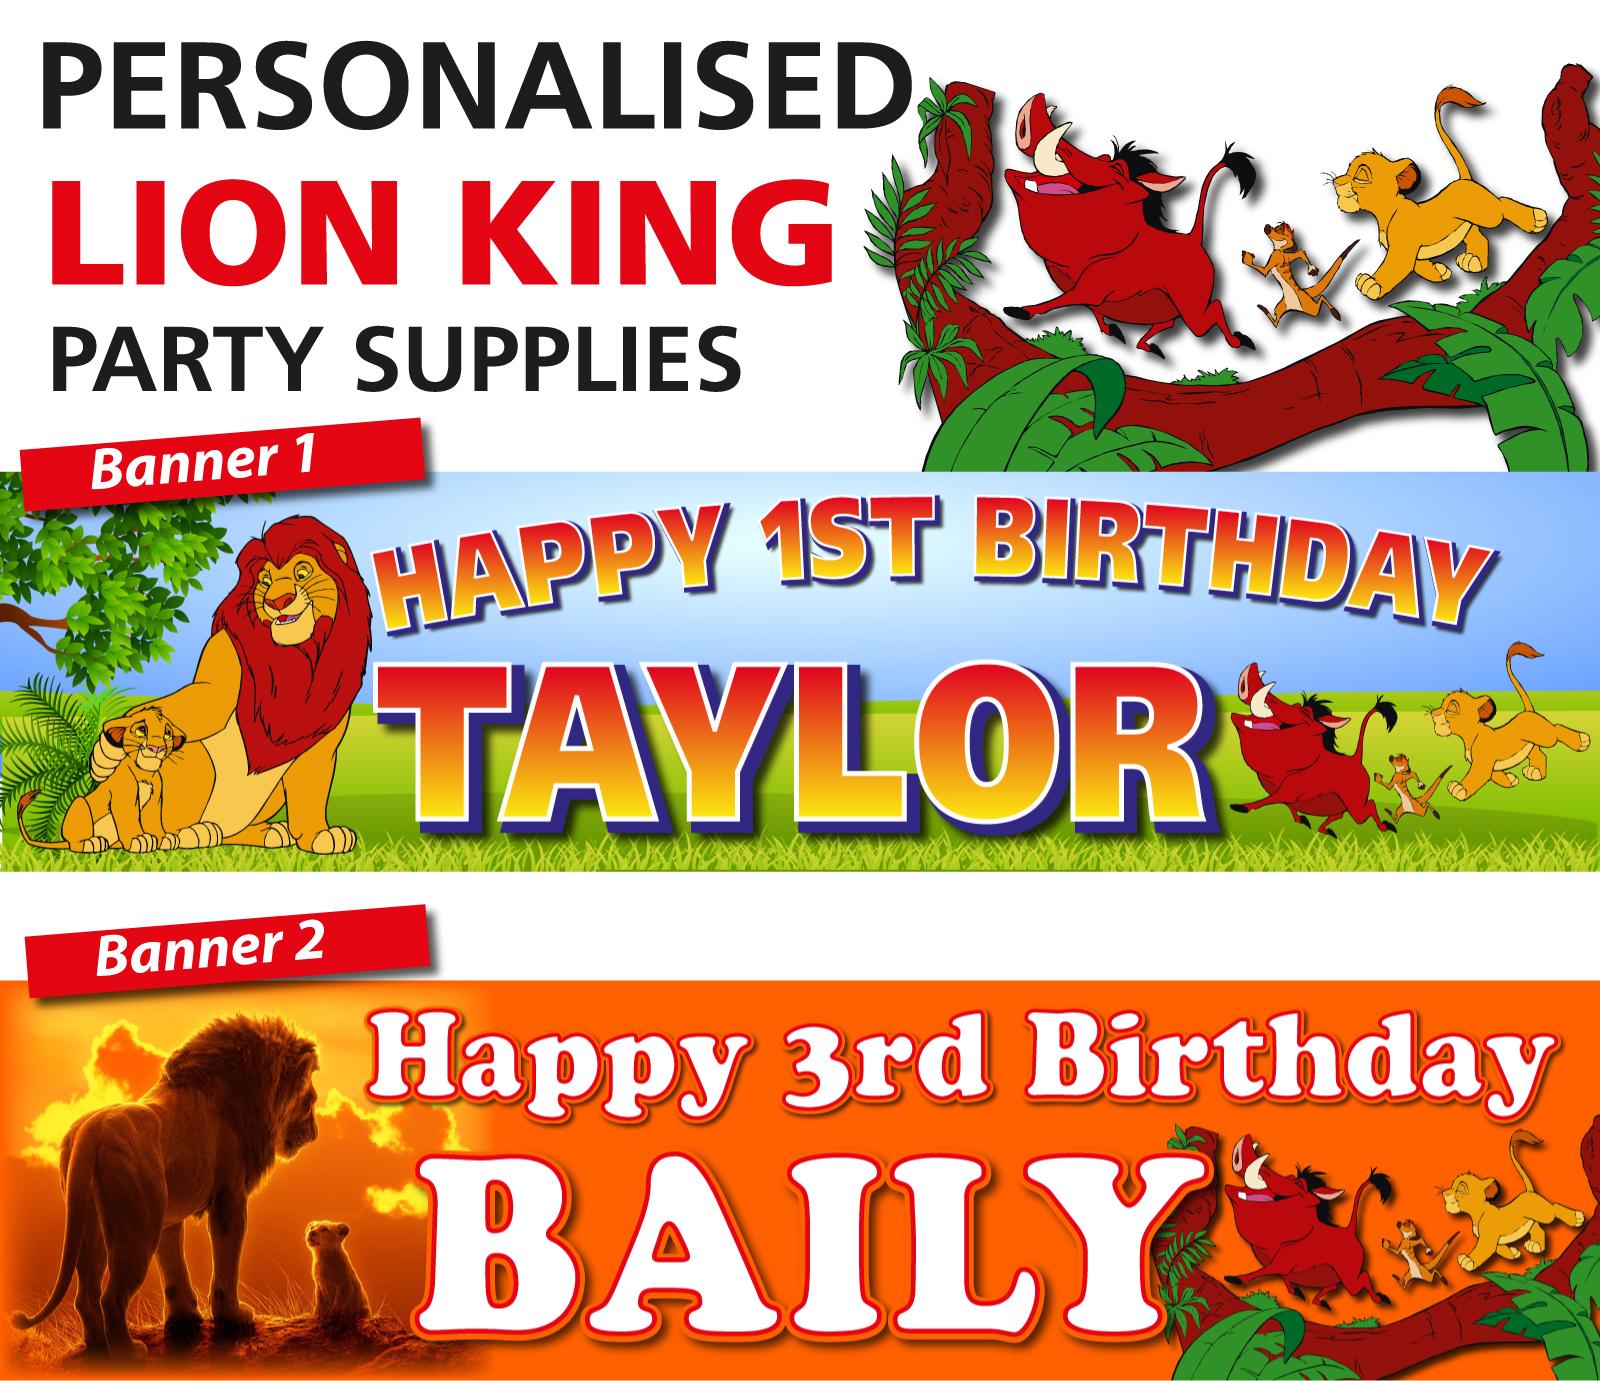 lion-king-birthday-banner-ebay.jpg